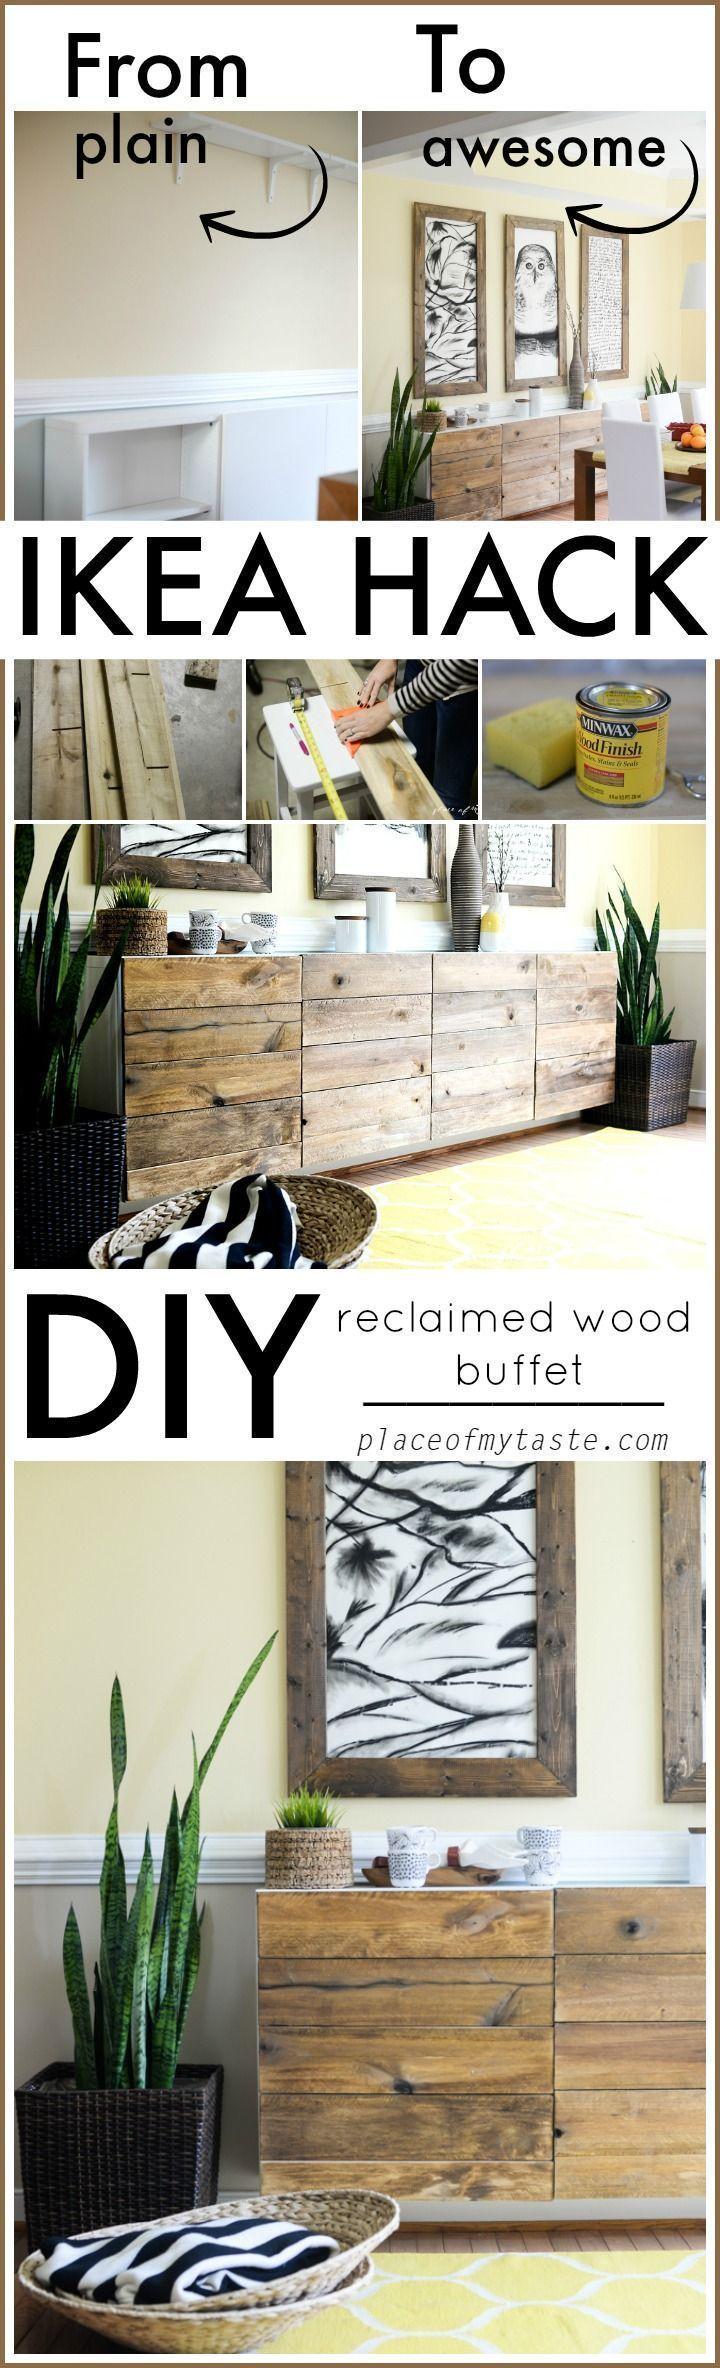 diy reclaimed wood bufet ikea hack schr nke upstylen. Black Bedroom Furniture Sets. Home Design Ideas